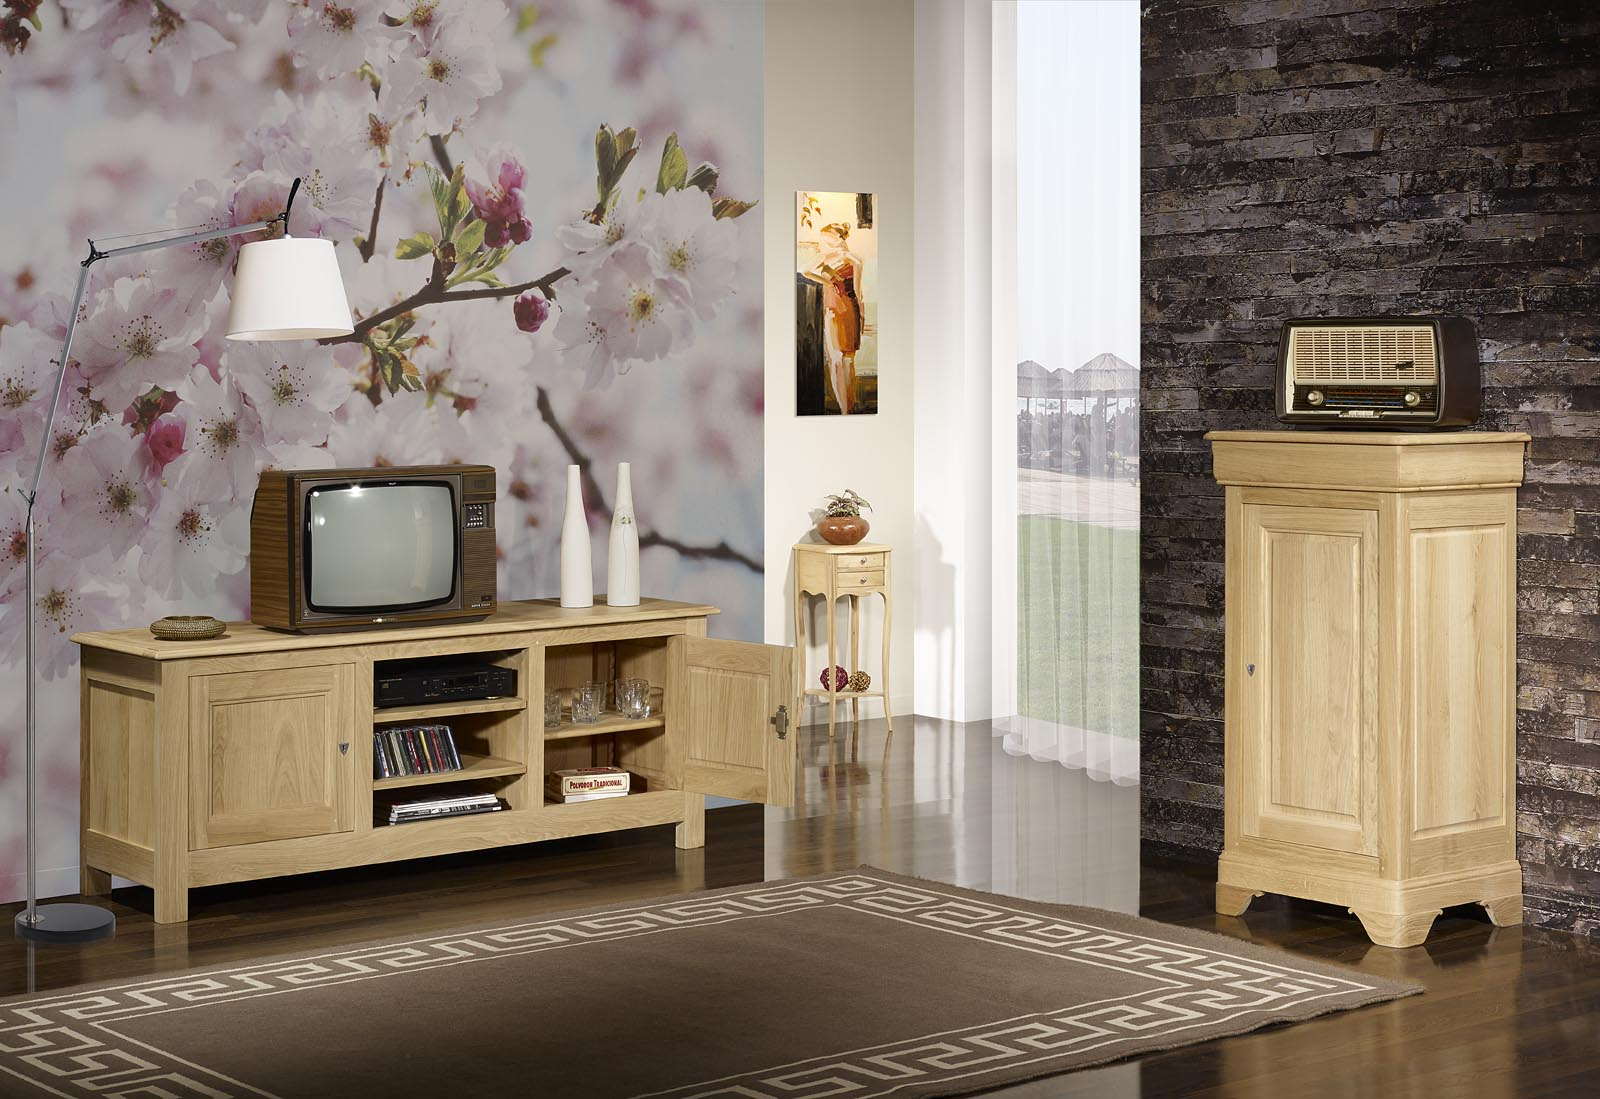 Amazing Moderniser Meuble Chene Meuble De Tv En Bois Massif U Artzein With  Moderniser Un Meuble En Chne